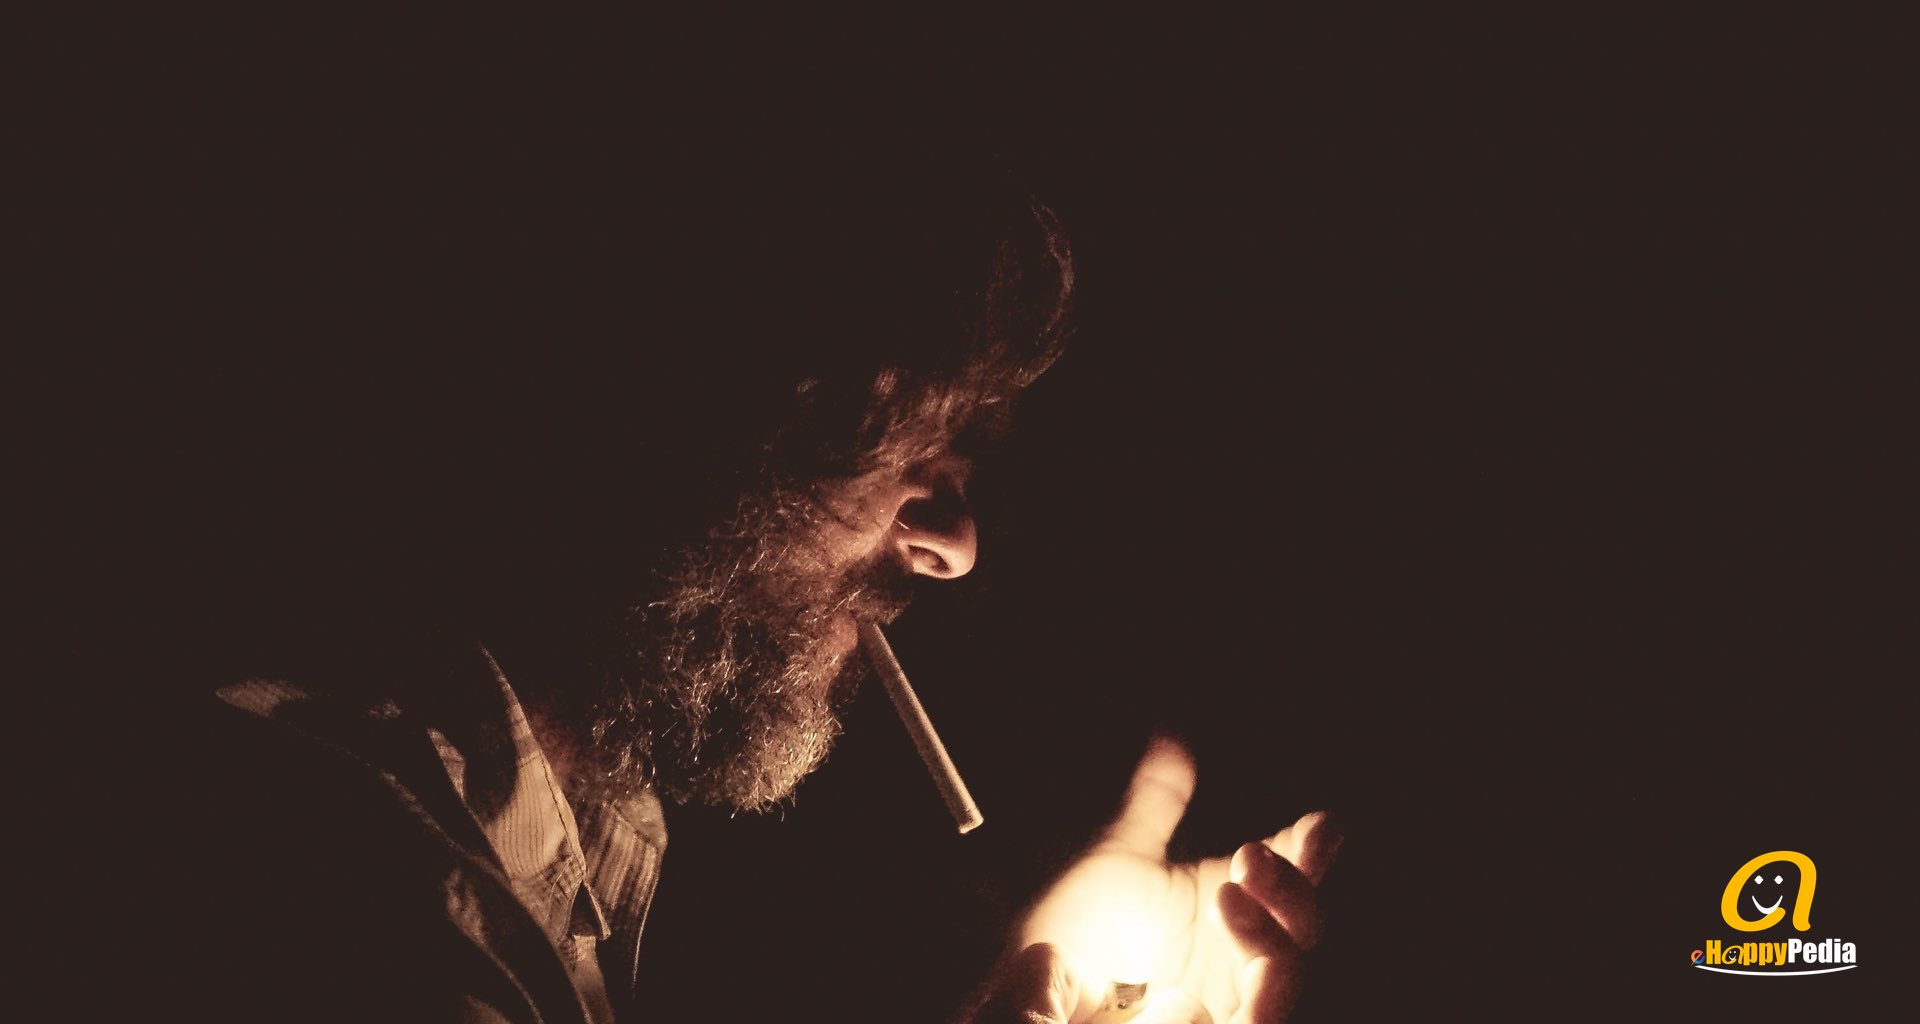 blog - man smoking night light.jpeg